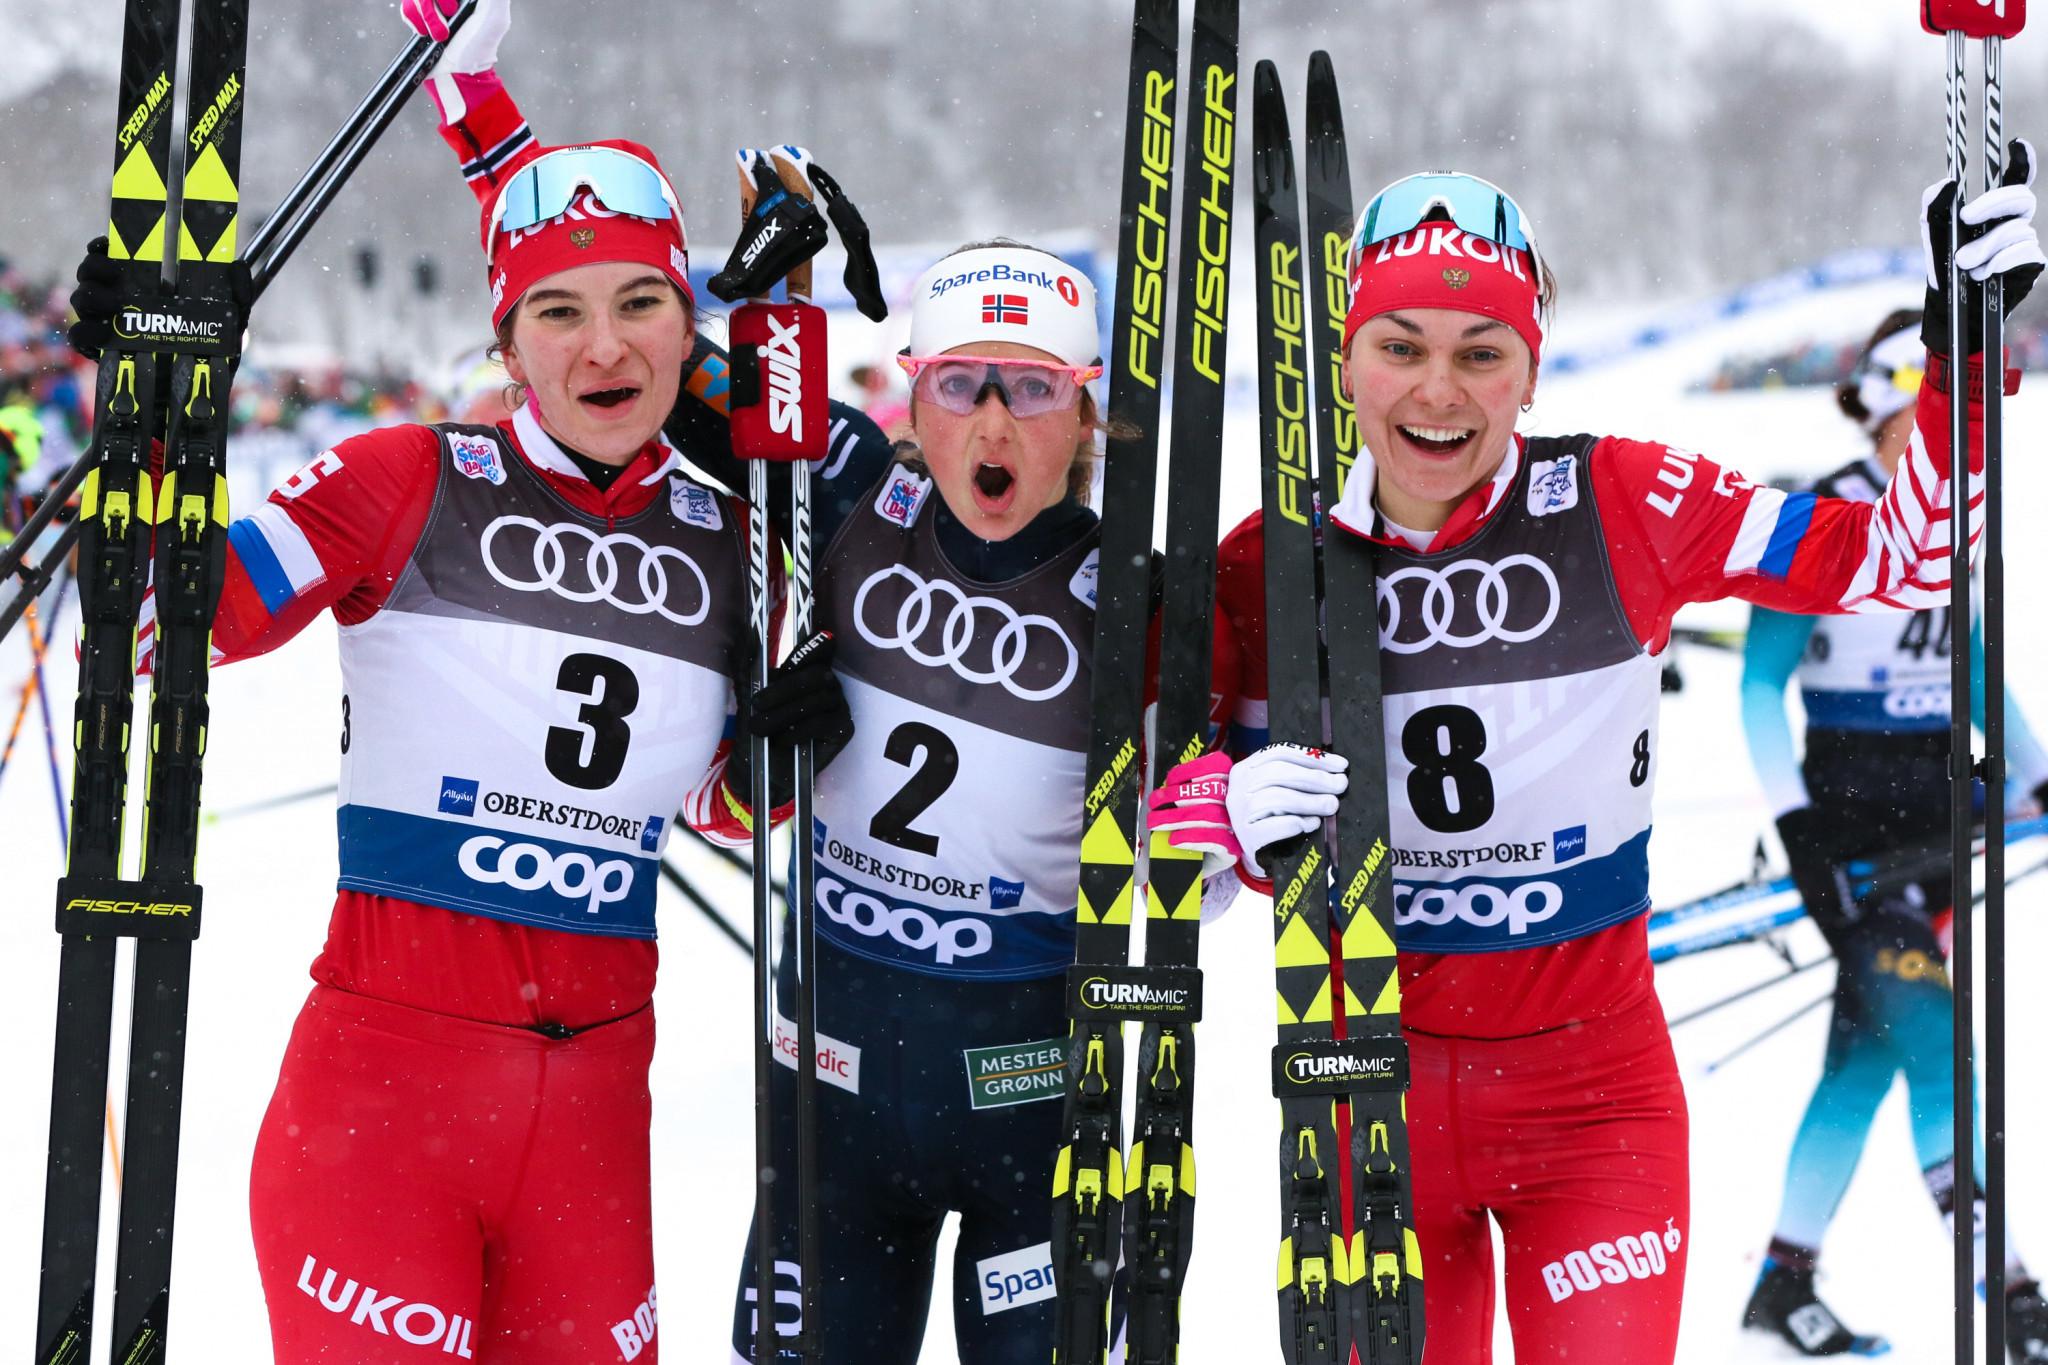 Østberg wins women's Oberstdorf mass start to take overall Tour de Ski lead as Iversen claims men's race